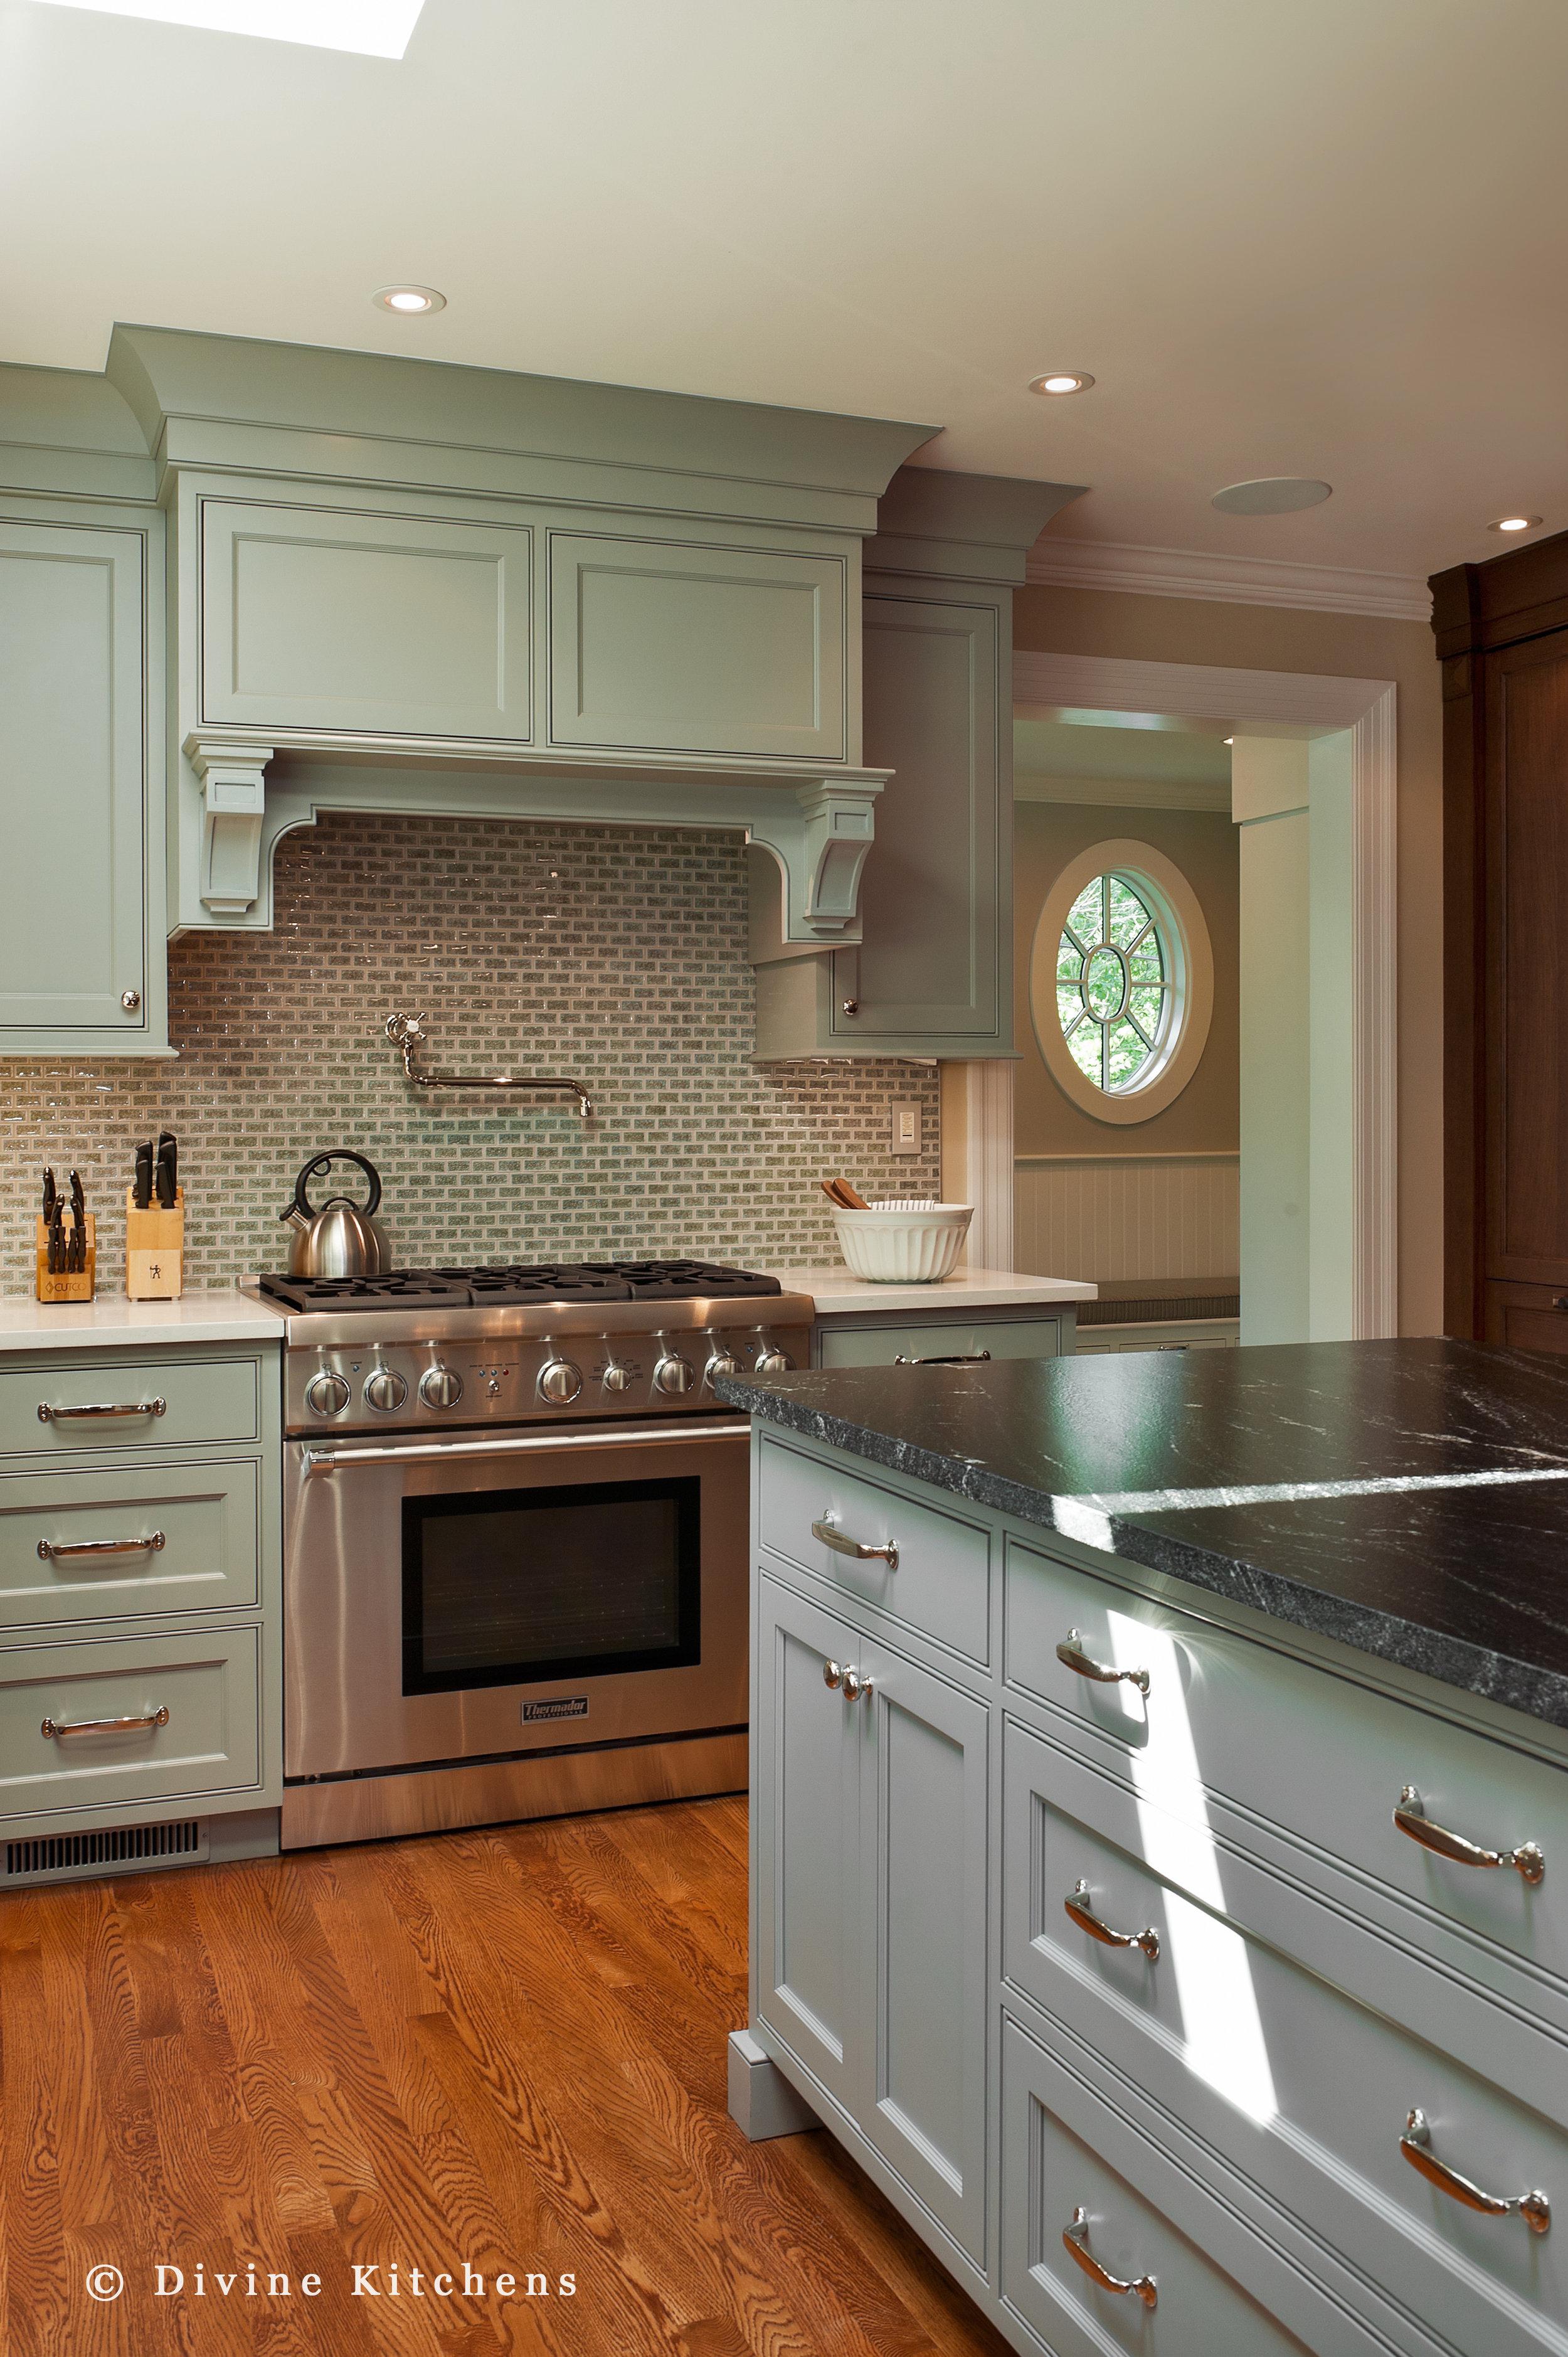 Traditional kitchen inside a historic victorian home. Large windows. Light blue and dark wood shaker cabinets. Mosaic tile backsplash, wolf appliances. Farmhouse sink.